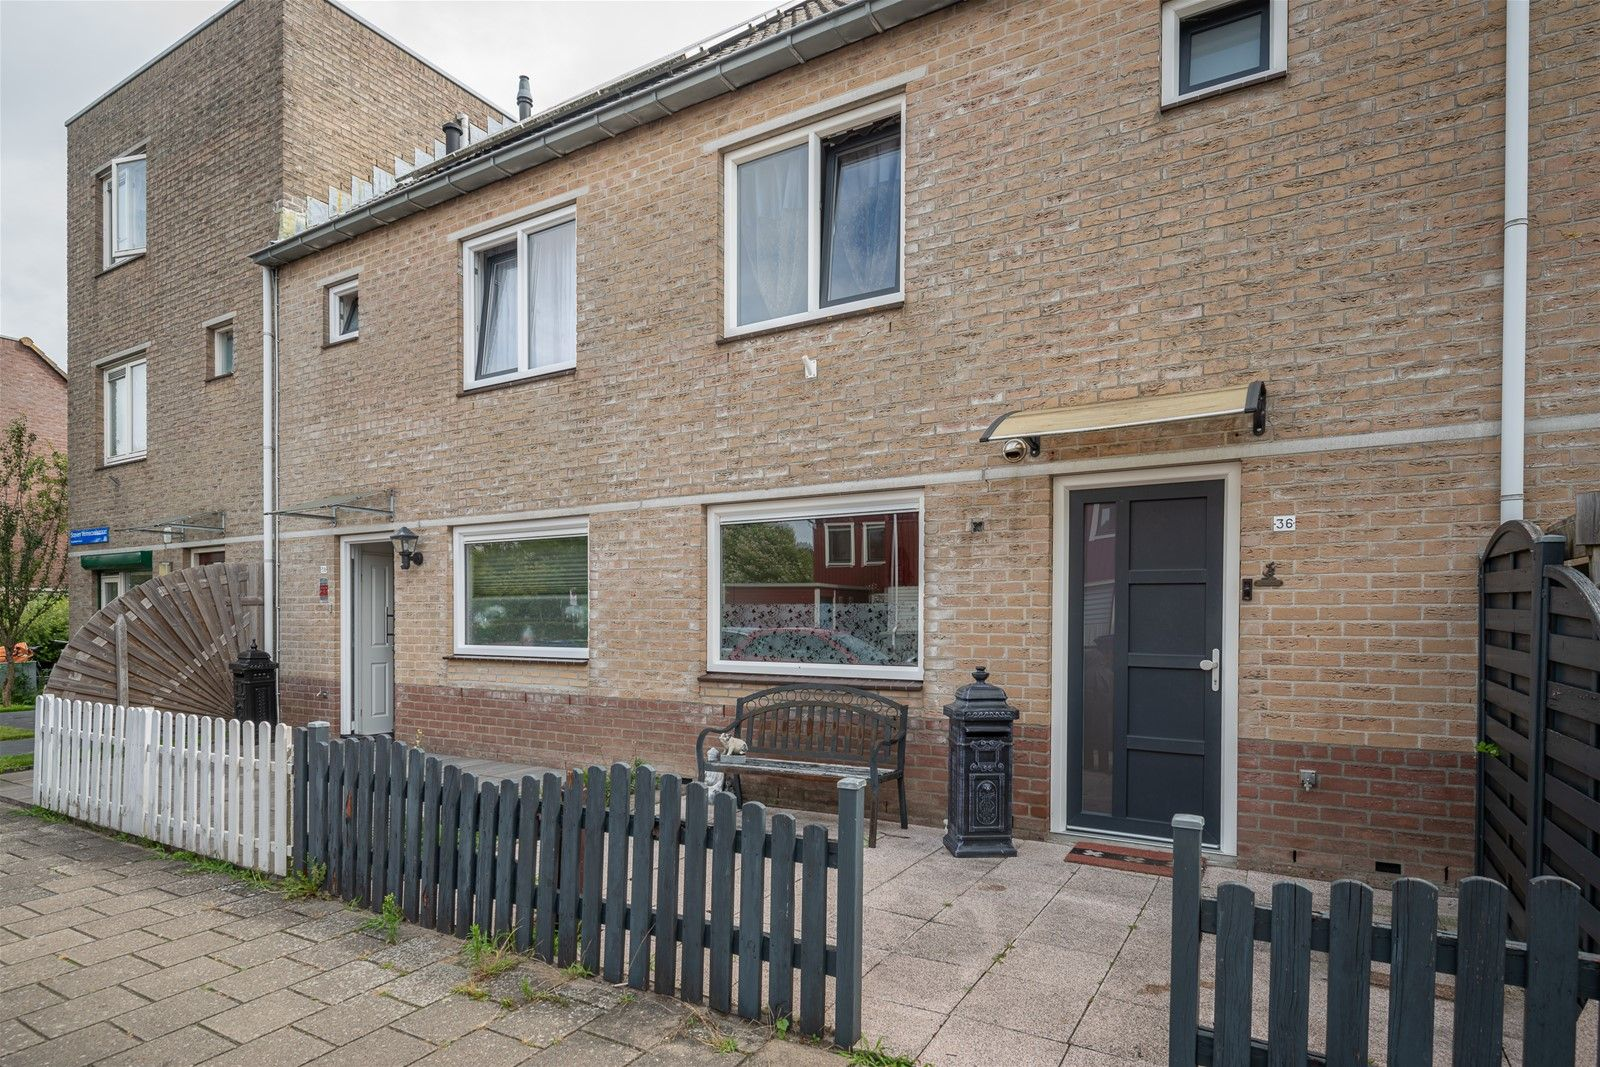 Steven Vennecoolstraat 36, Almere